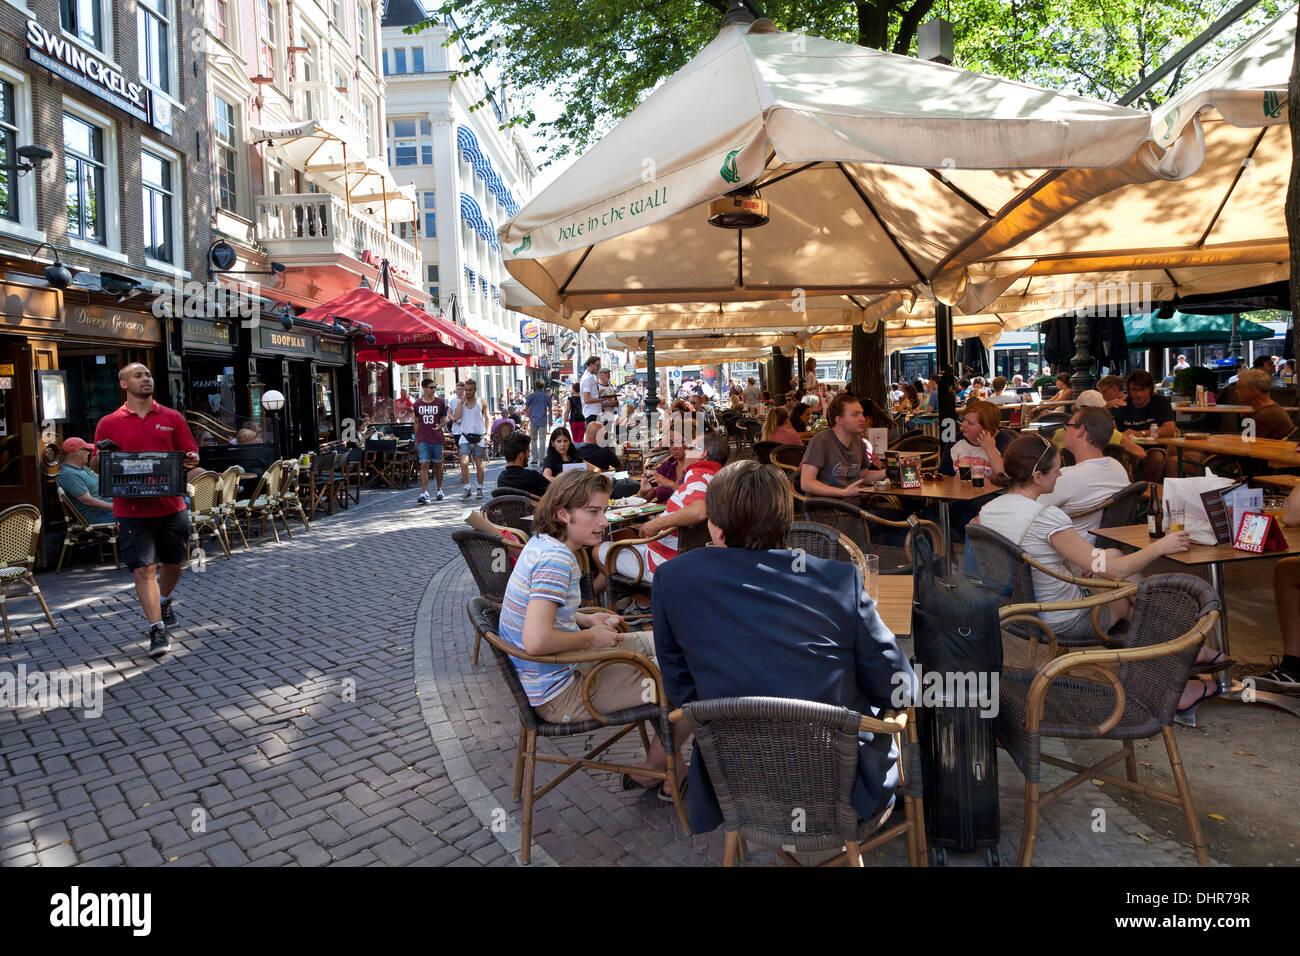 Terrazze in estate sulla Leidseplein in Amsterdam, Paesi Bassi Immagini Stock